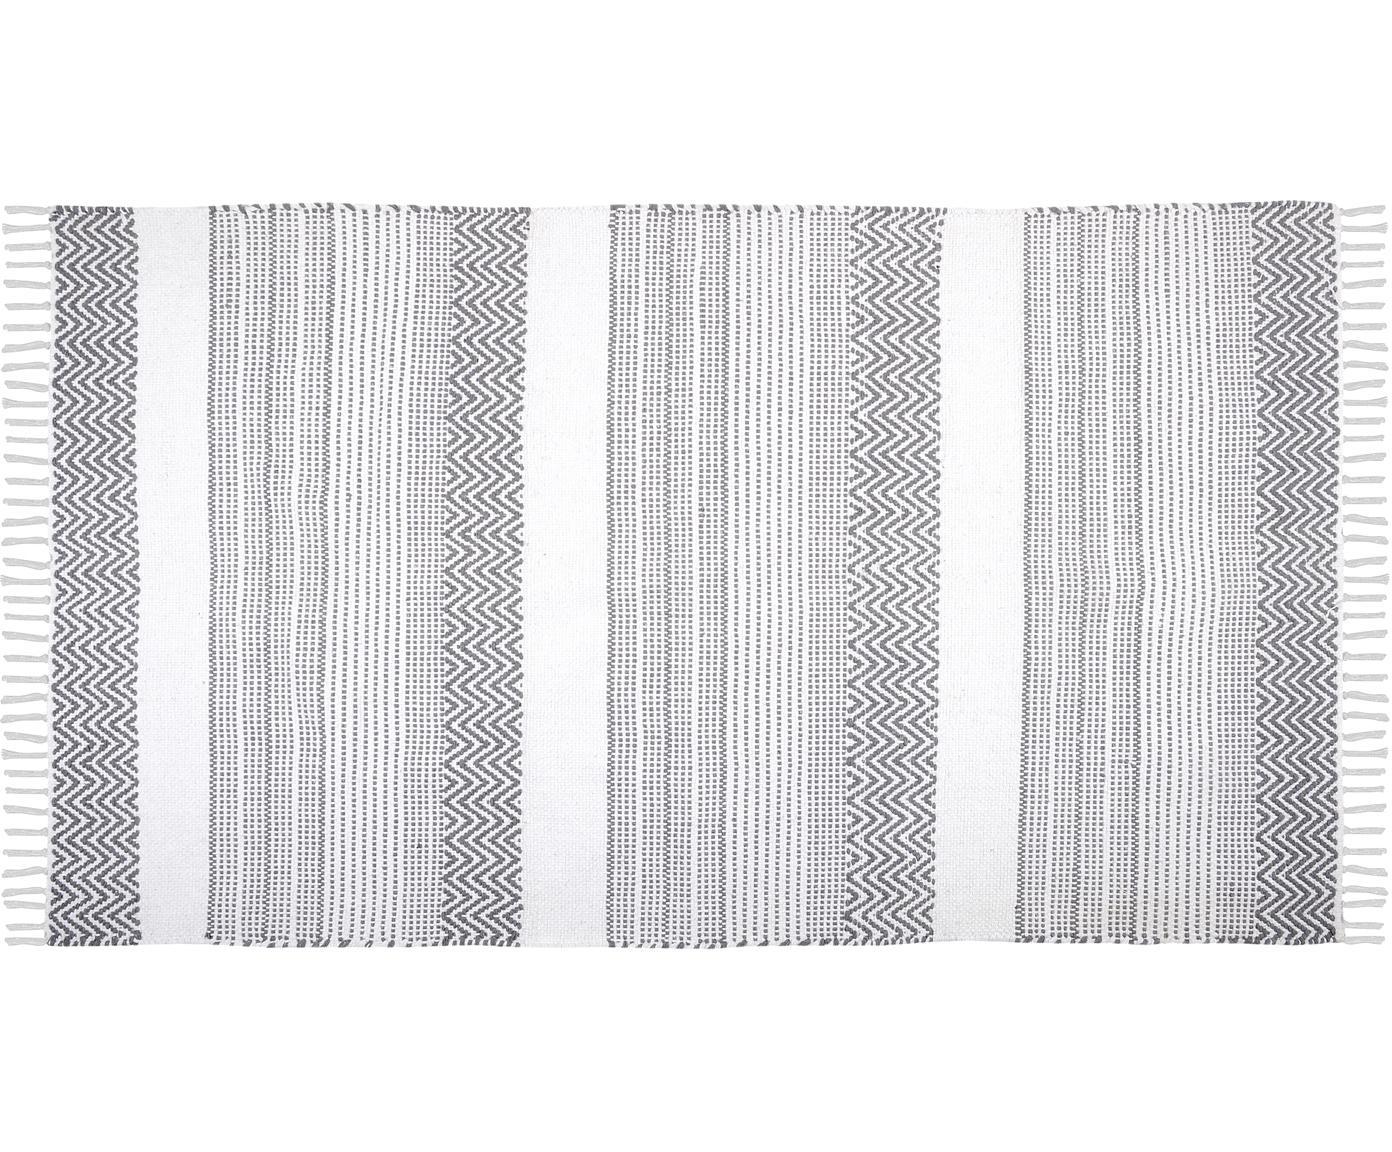 Alfombra de algodón Iceland, Algodón, Gris, blanco, An 90 x L 150 cm (Tamaño XS)